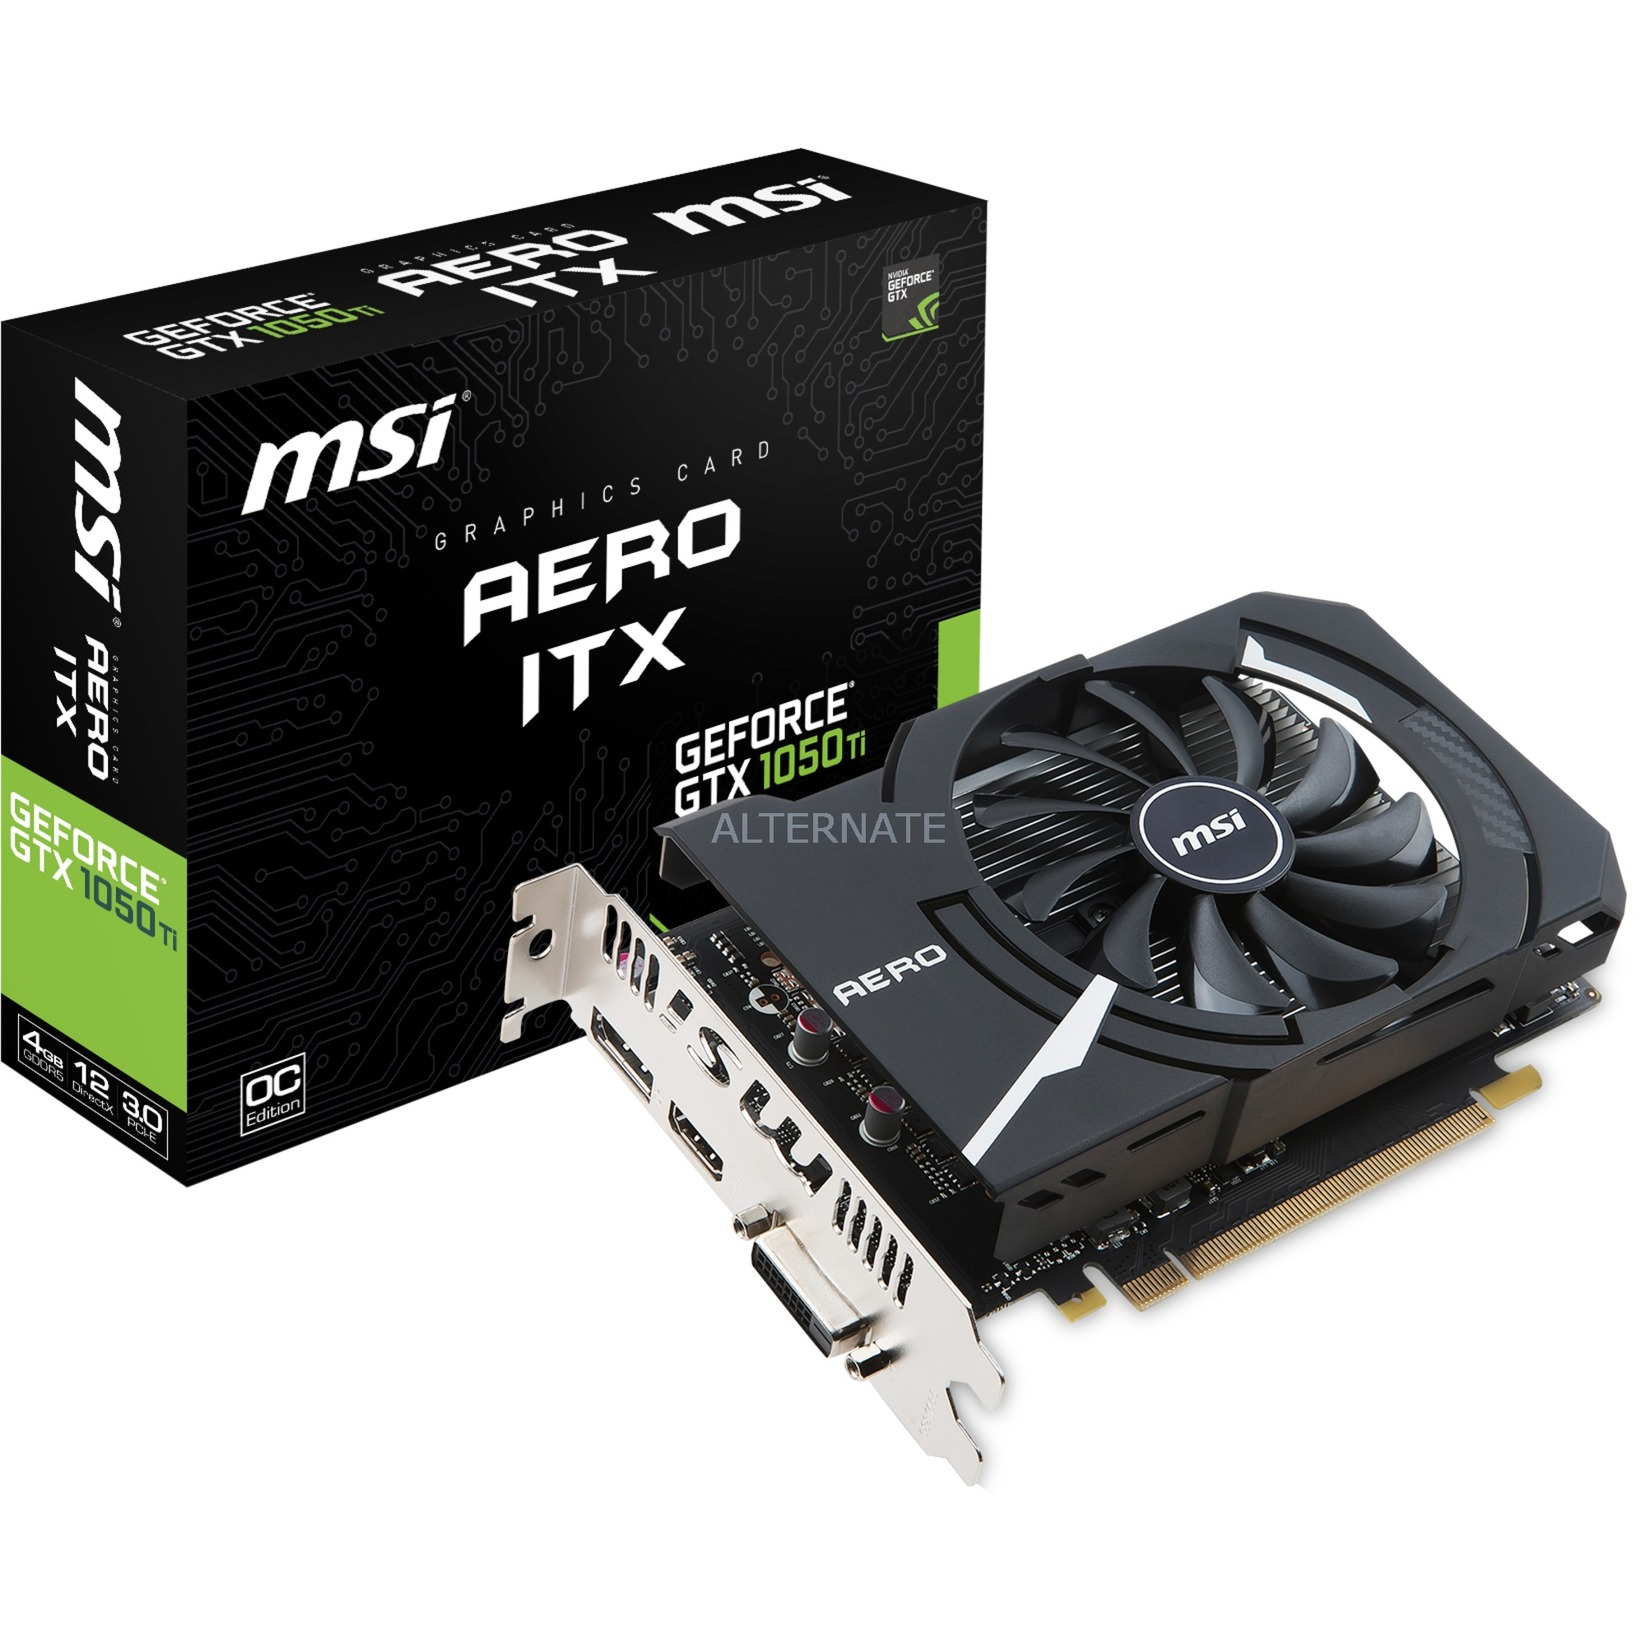 GeForce GTX 1050 Ti AERO ITX 4G OC, Tarjeta gráfica